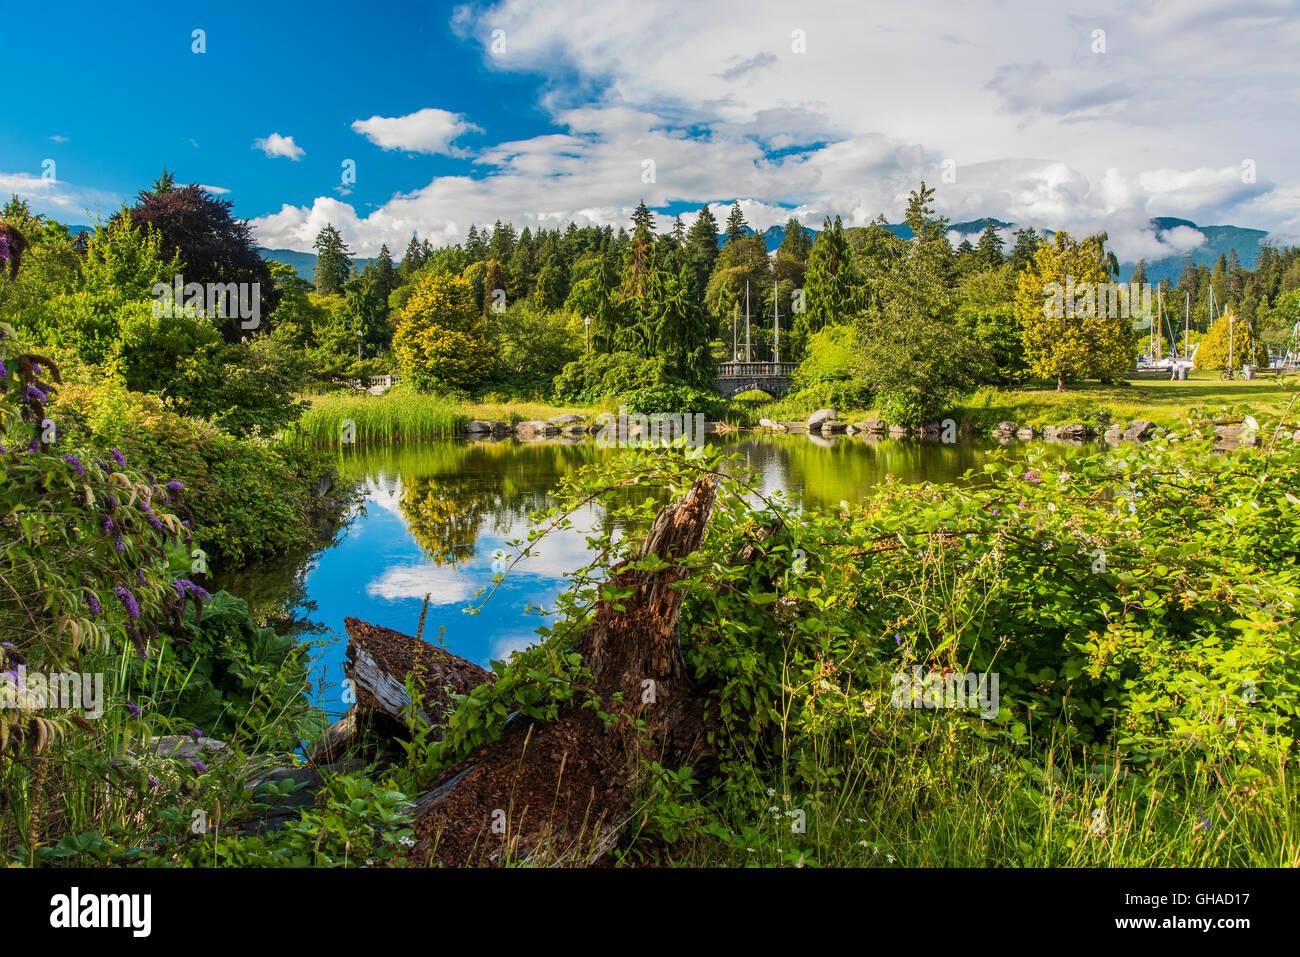 Stanley Park, Vancouver, British Columbia, Canadá Imagen De Stock